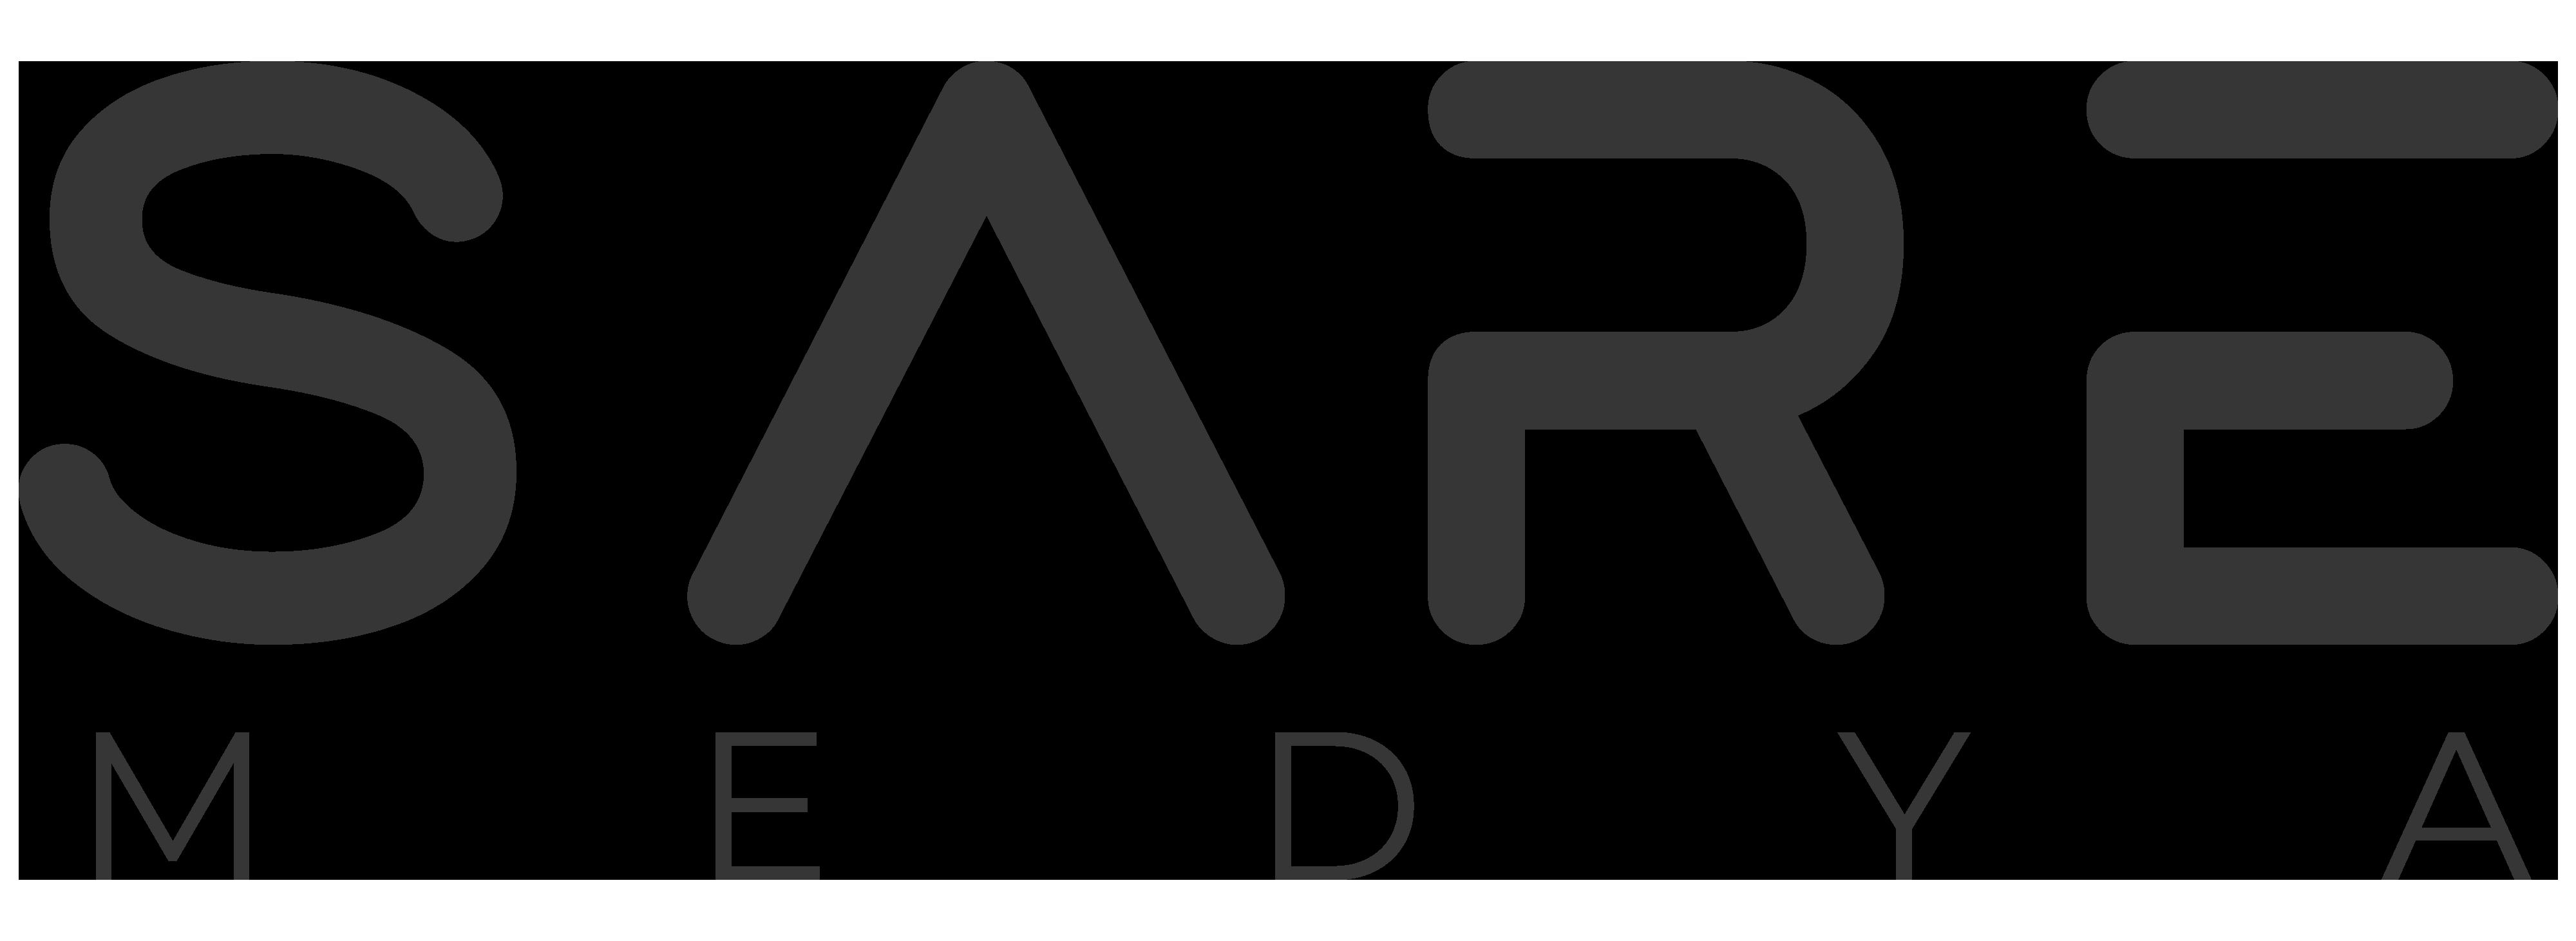 Sare Medya Logo